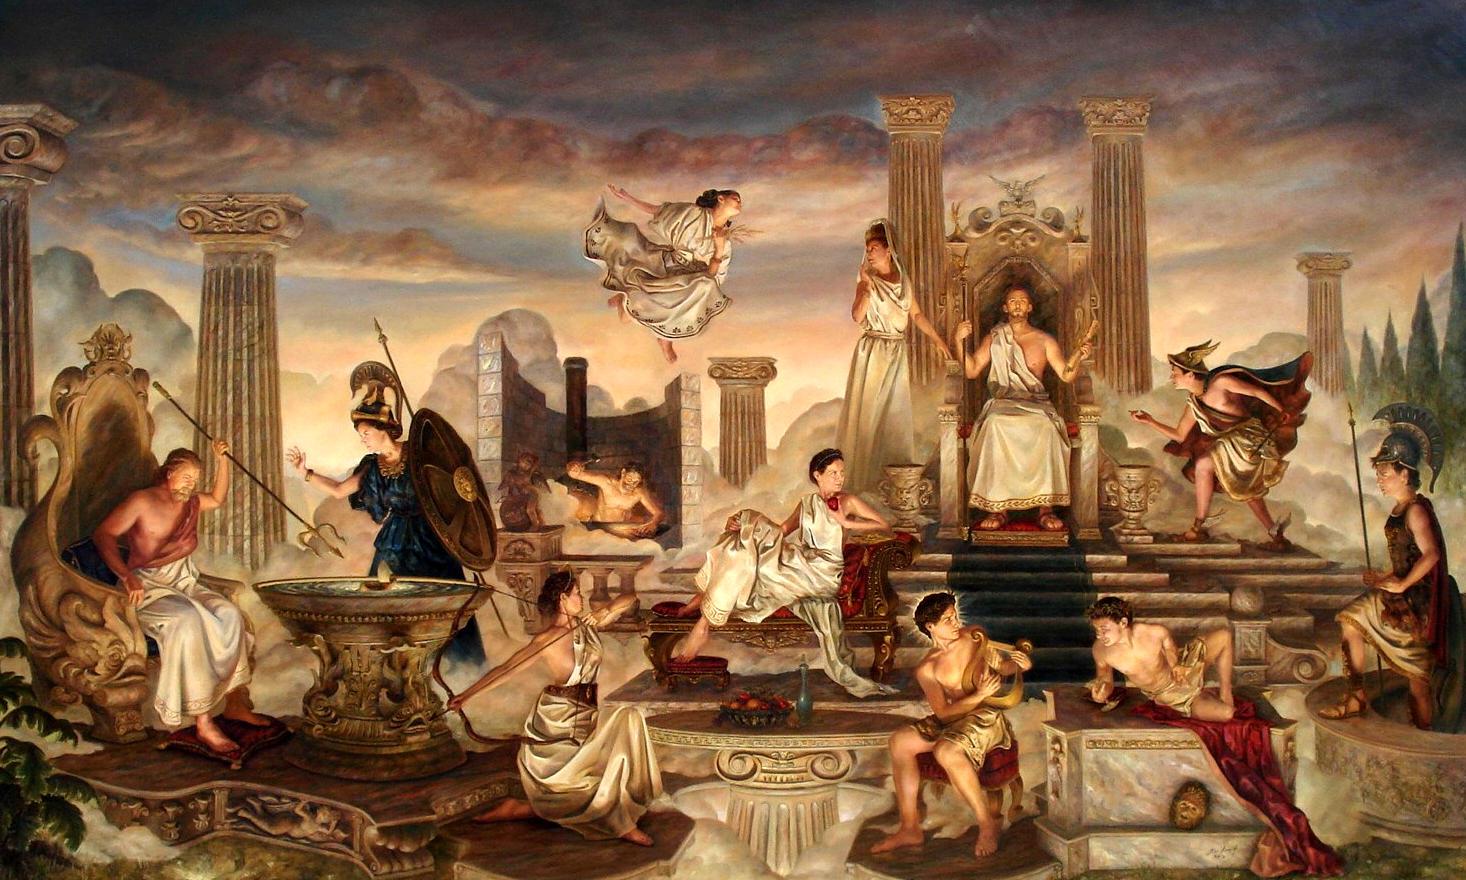 Risultati immagini per greek mythology mount olympus